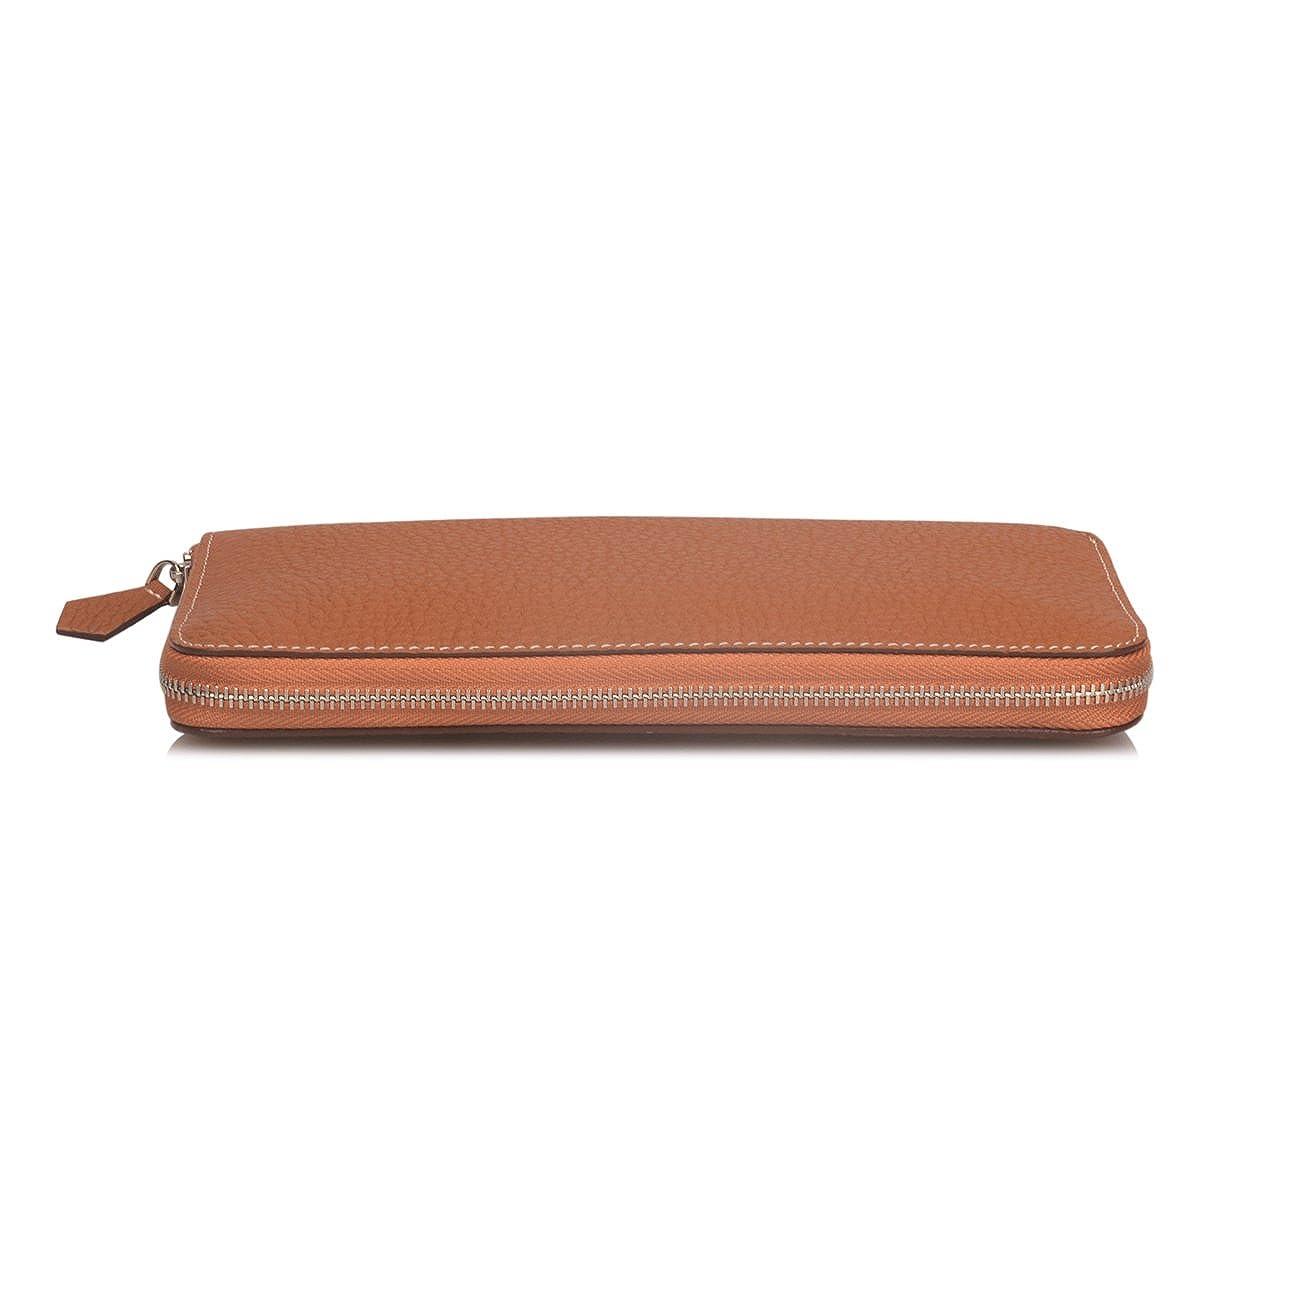 6ff90b28afe8 Anifeel Women's Padlock Genuine Leather Wallets Billfold Trifold Clutch